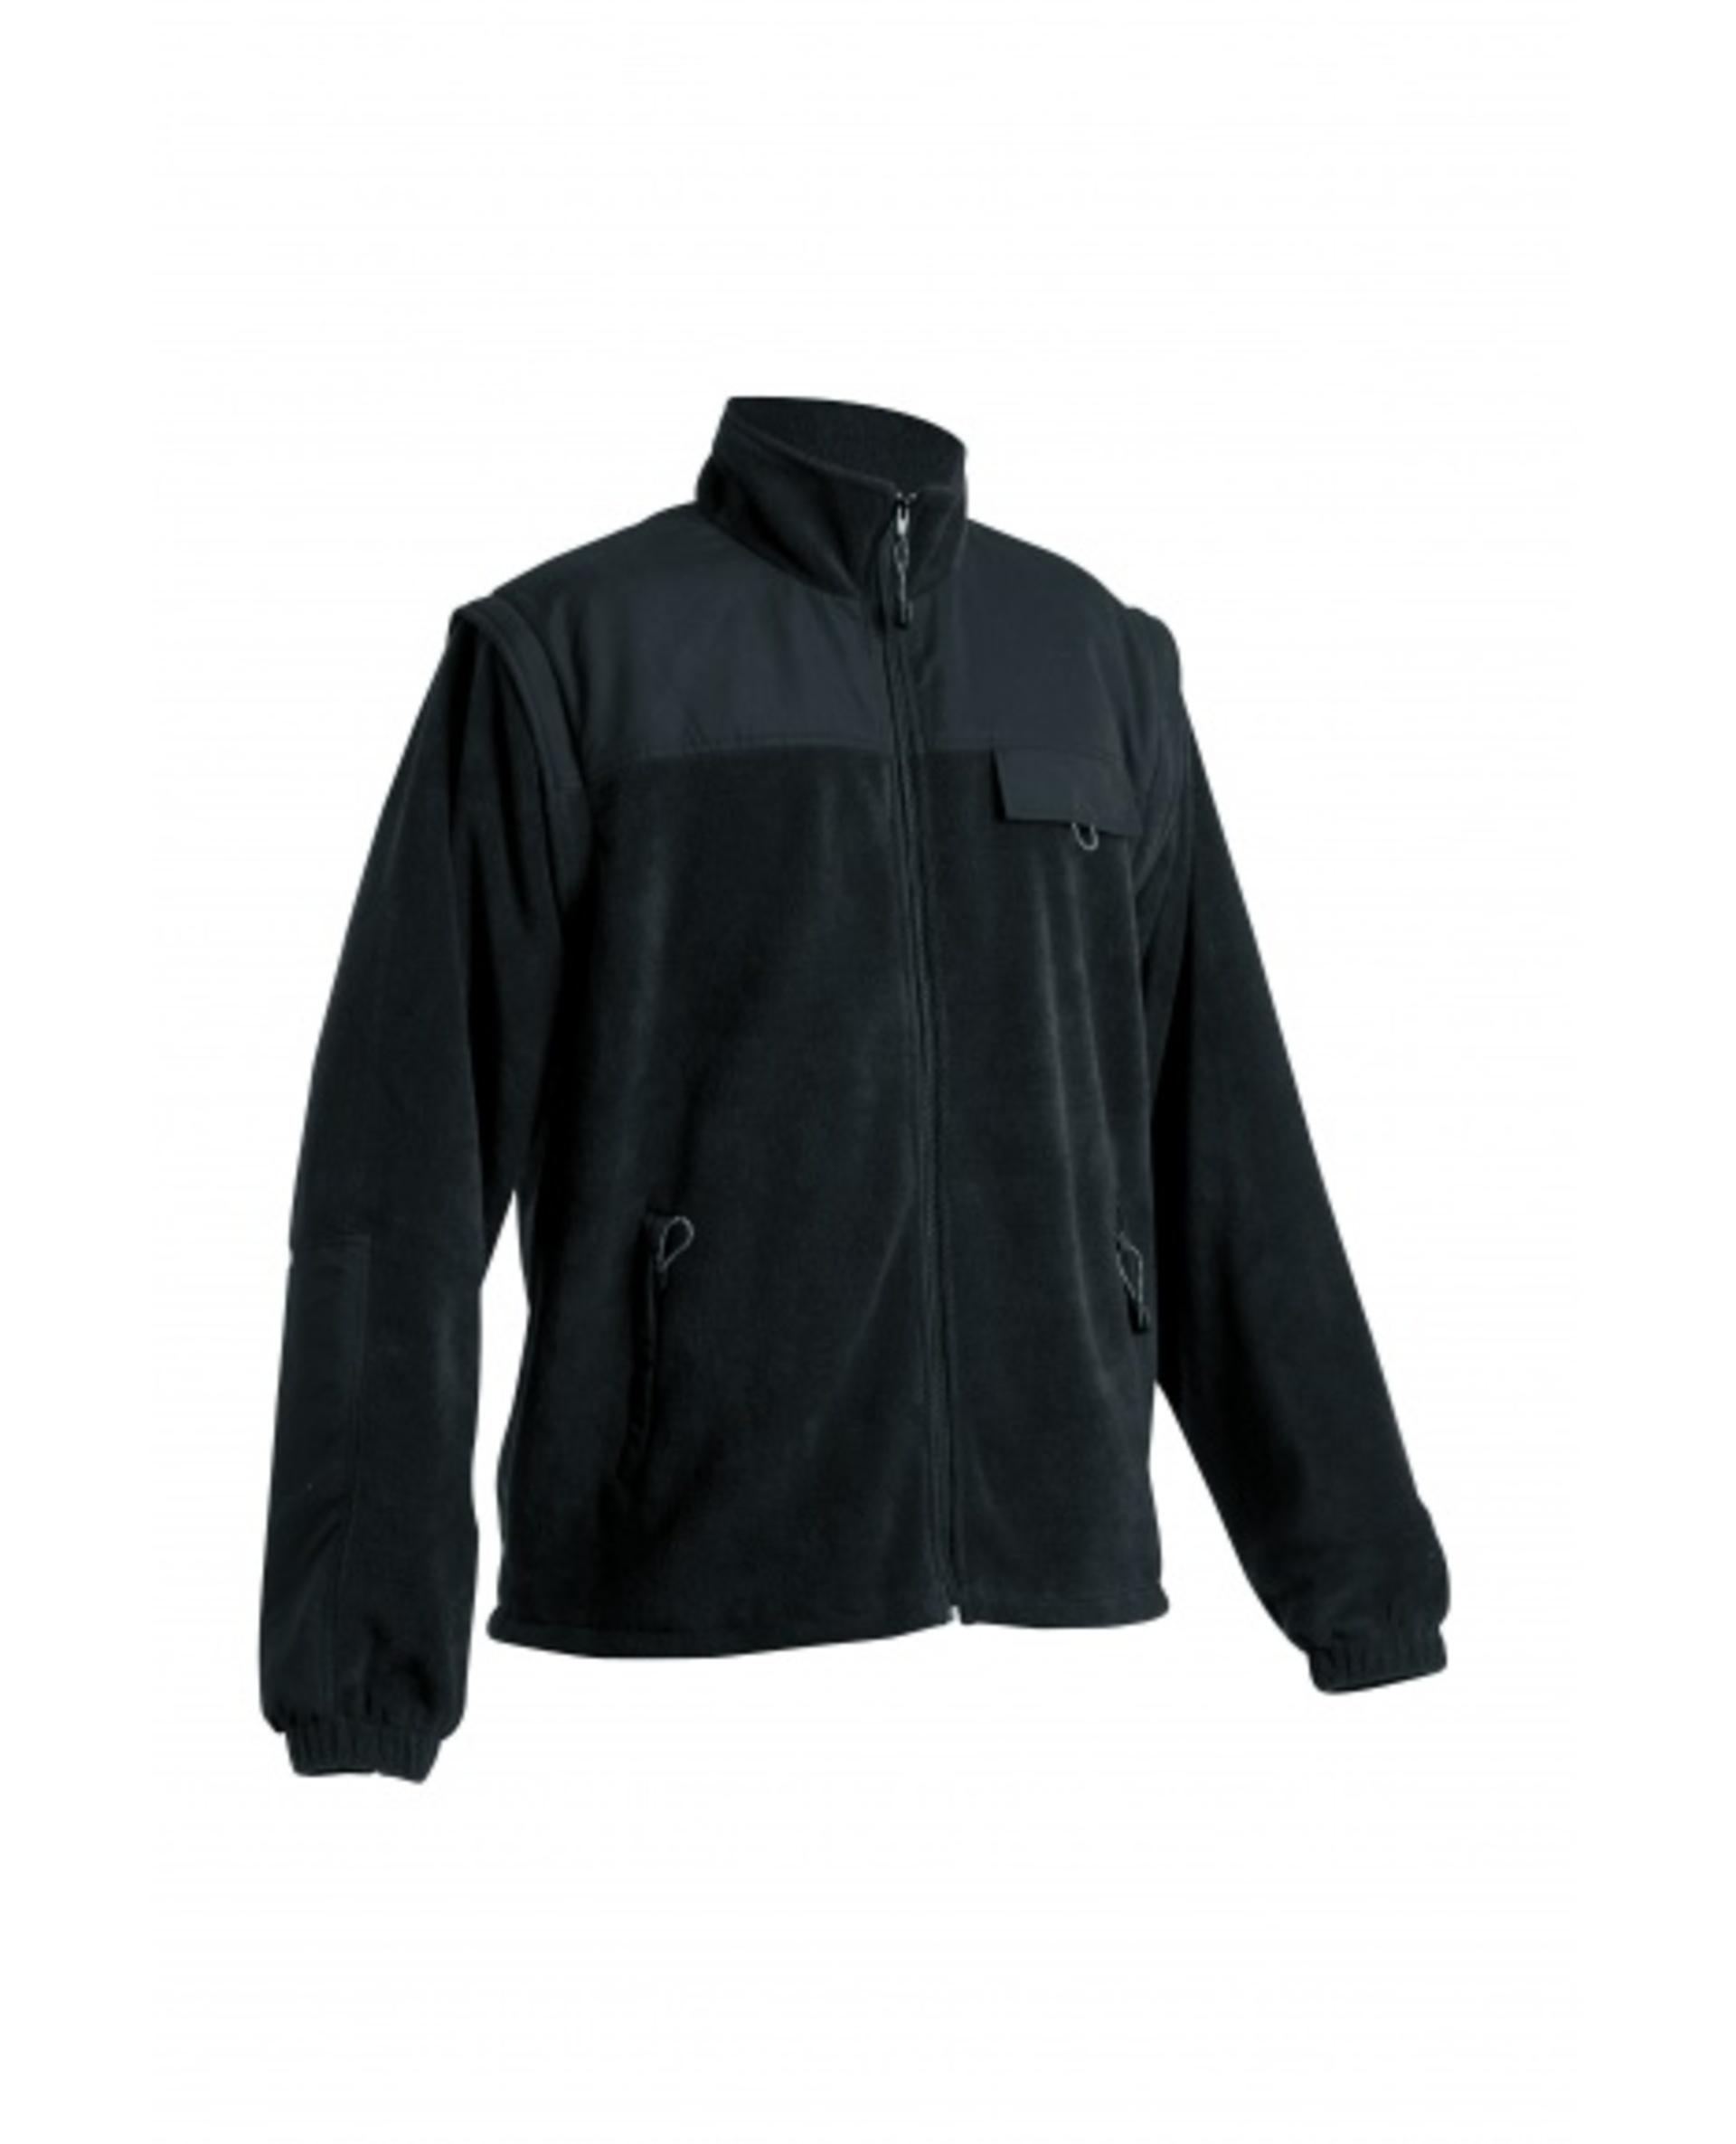 Cerva RANDWIK fleecová 2v1 Bunda černá XL